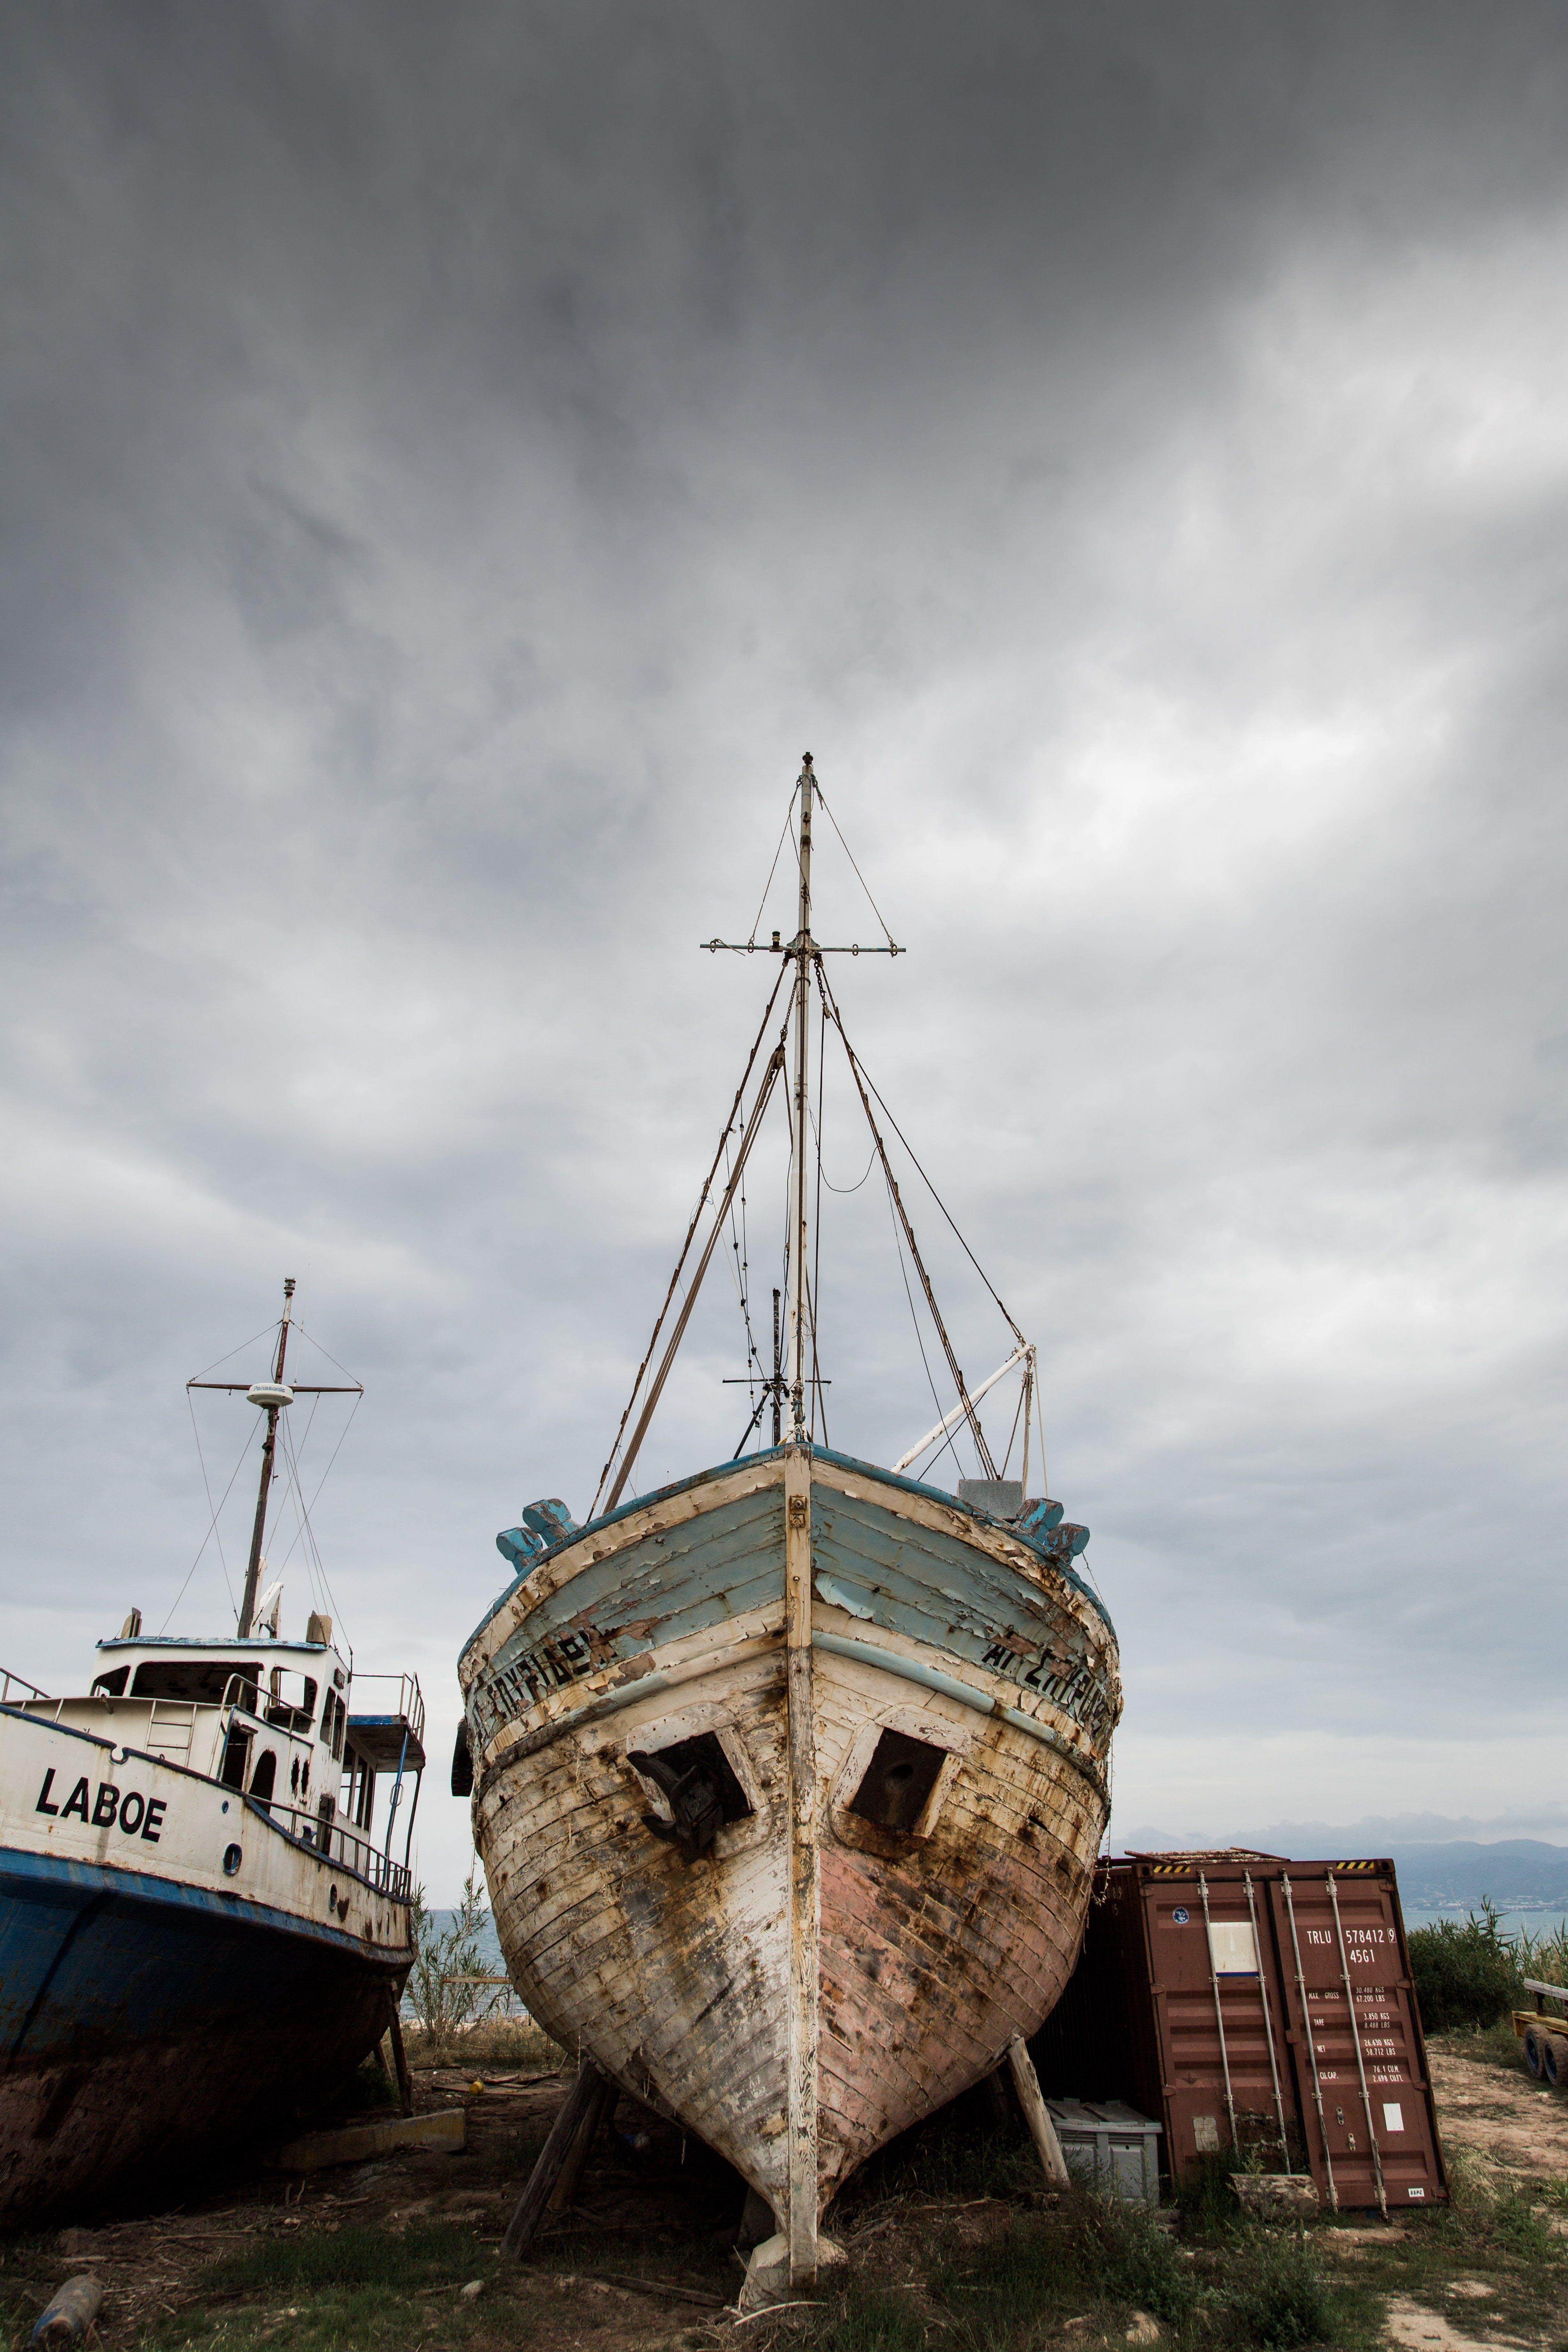 White Blue Boat